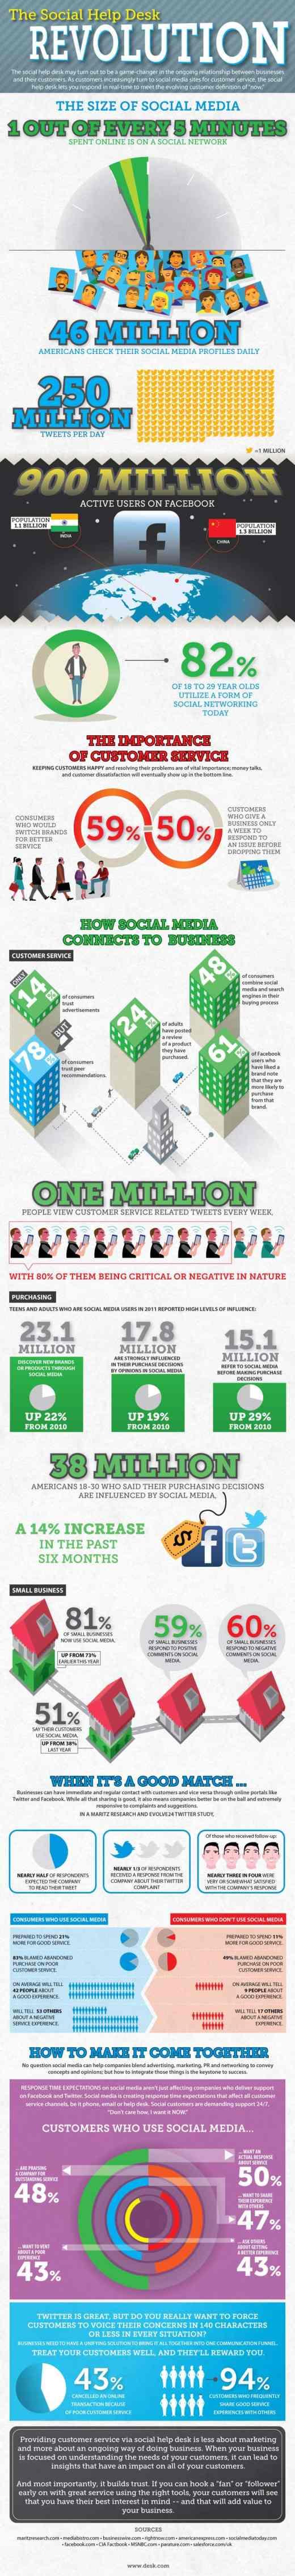 Help Desk Revolution Infographic